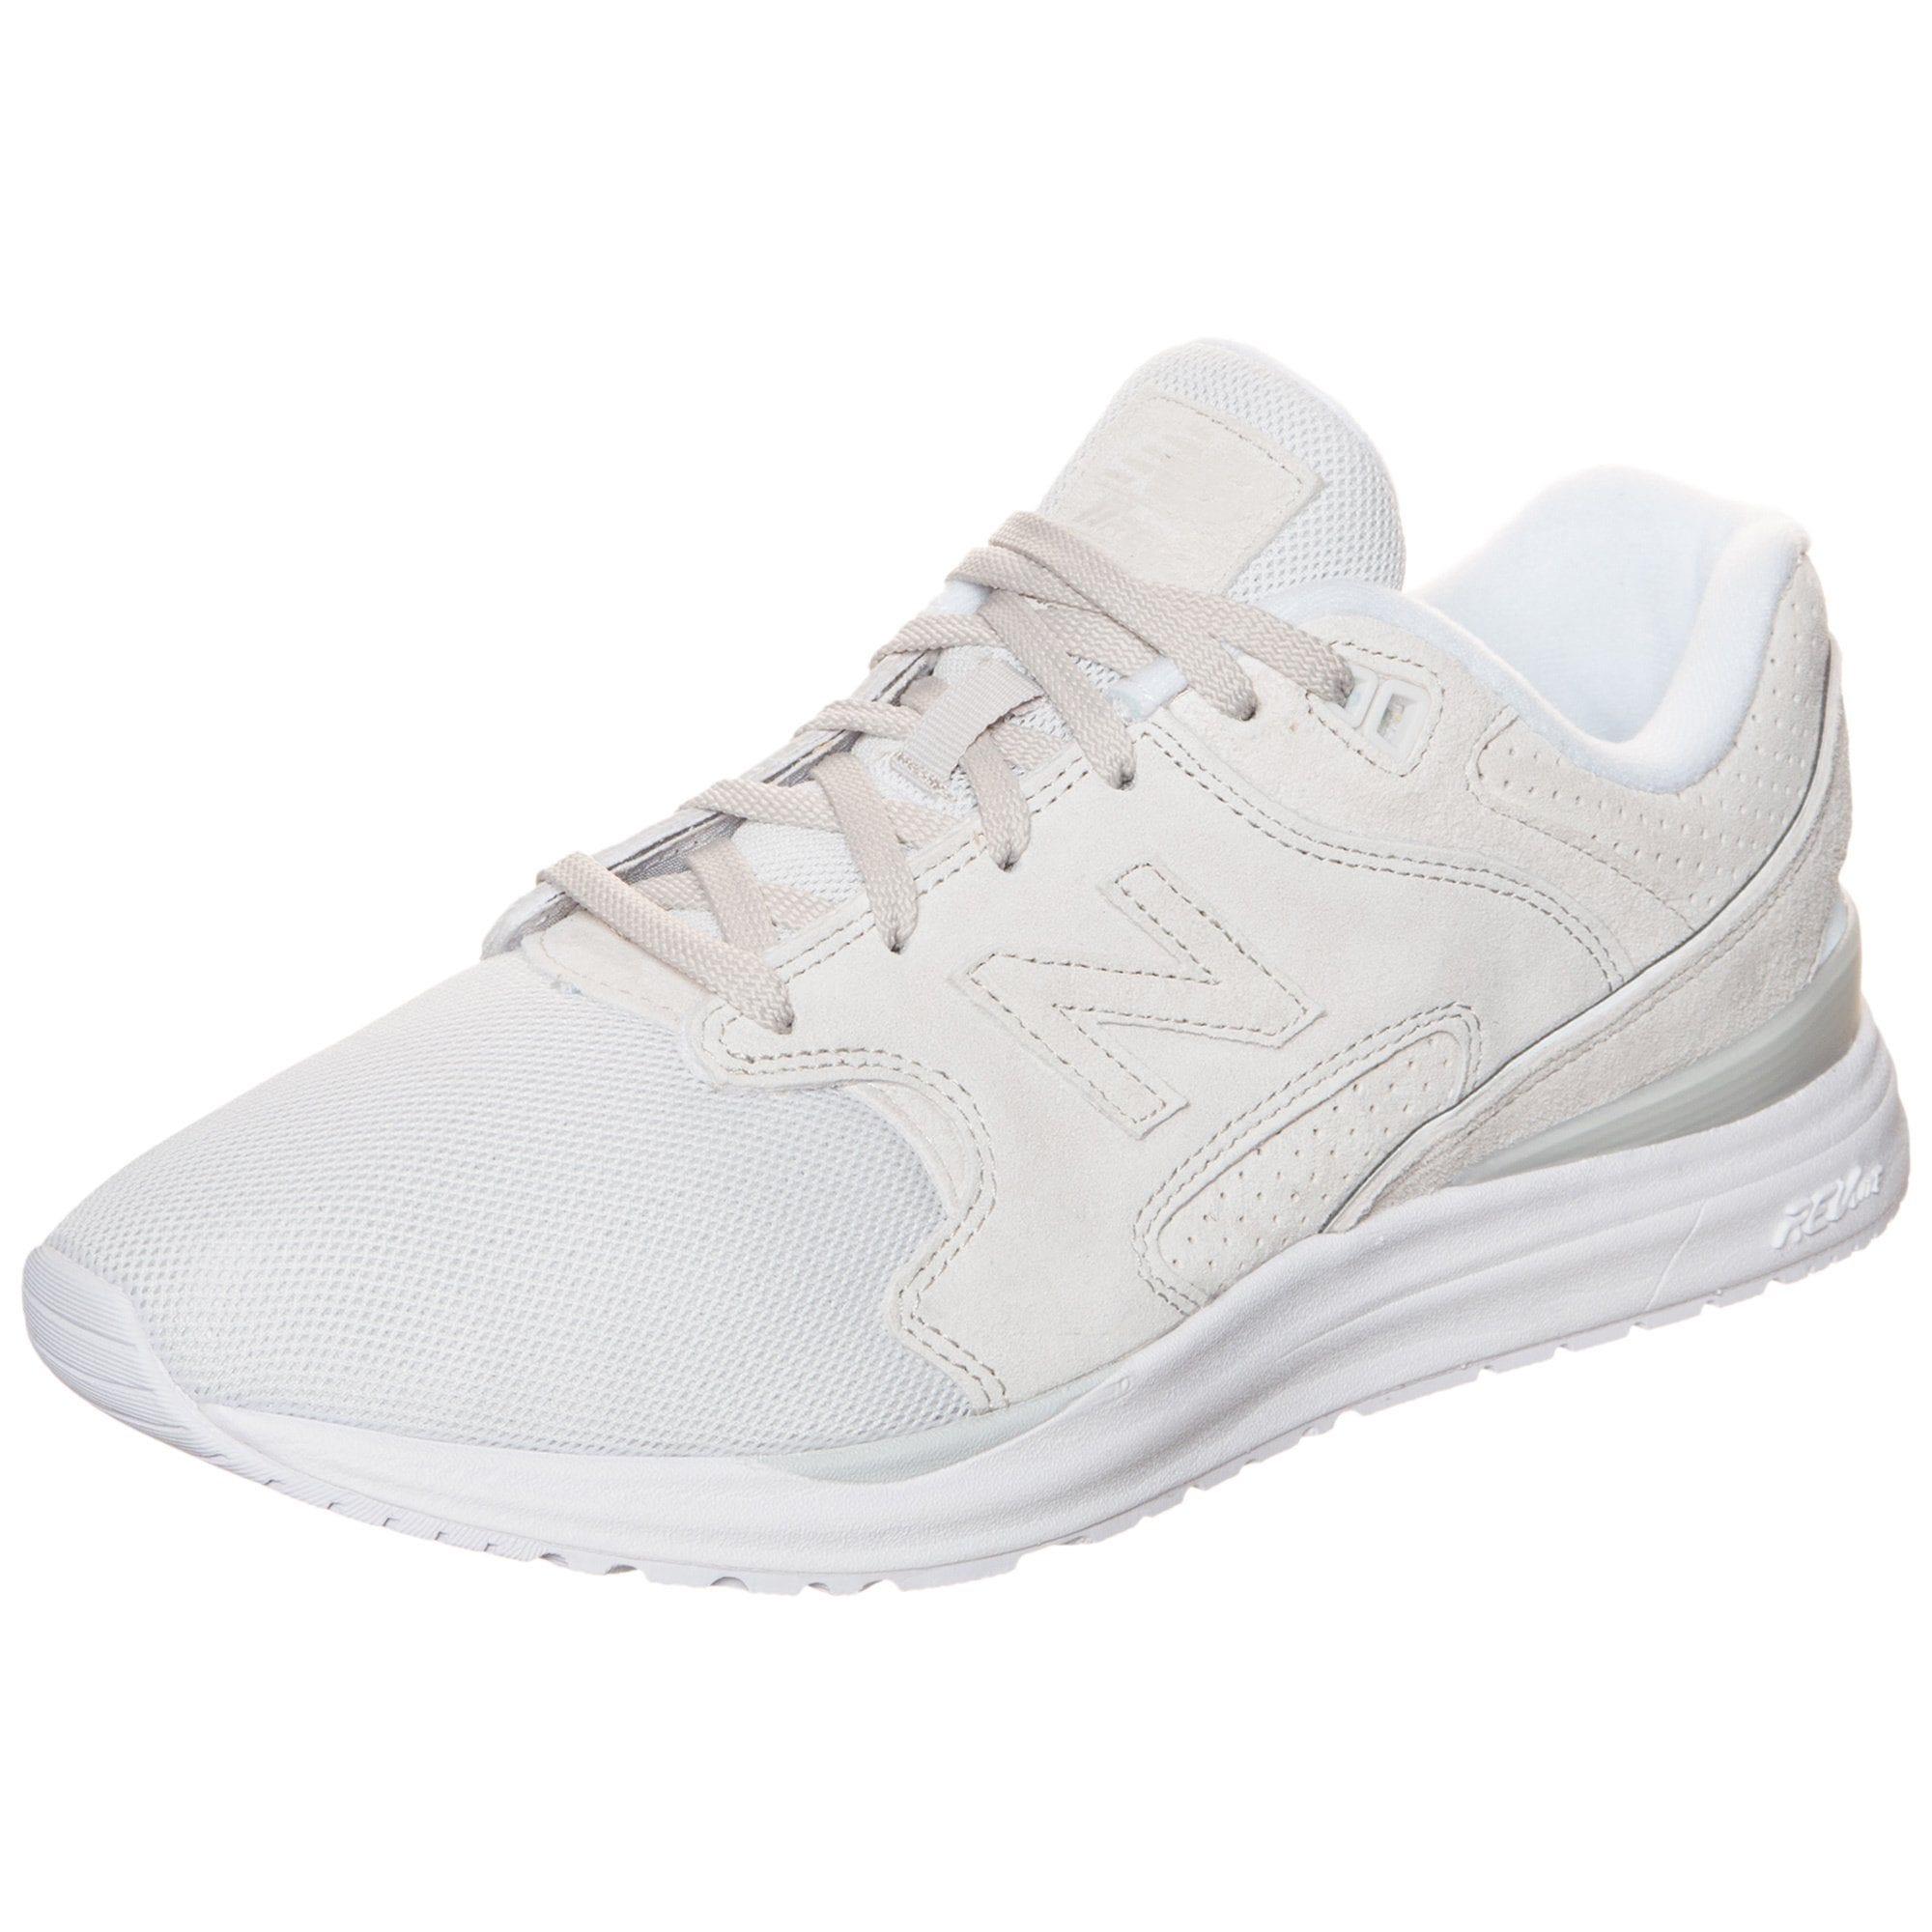 New Balance ML1550-CW-D Sneaker Herren